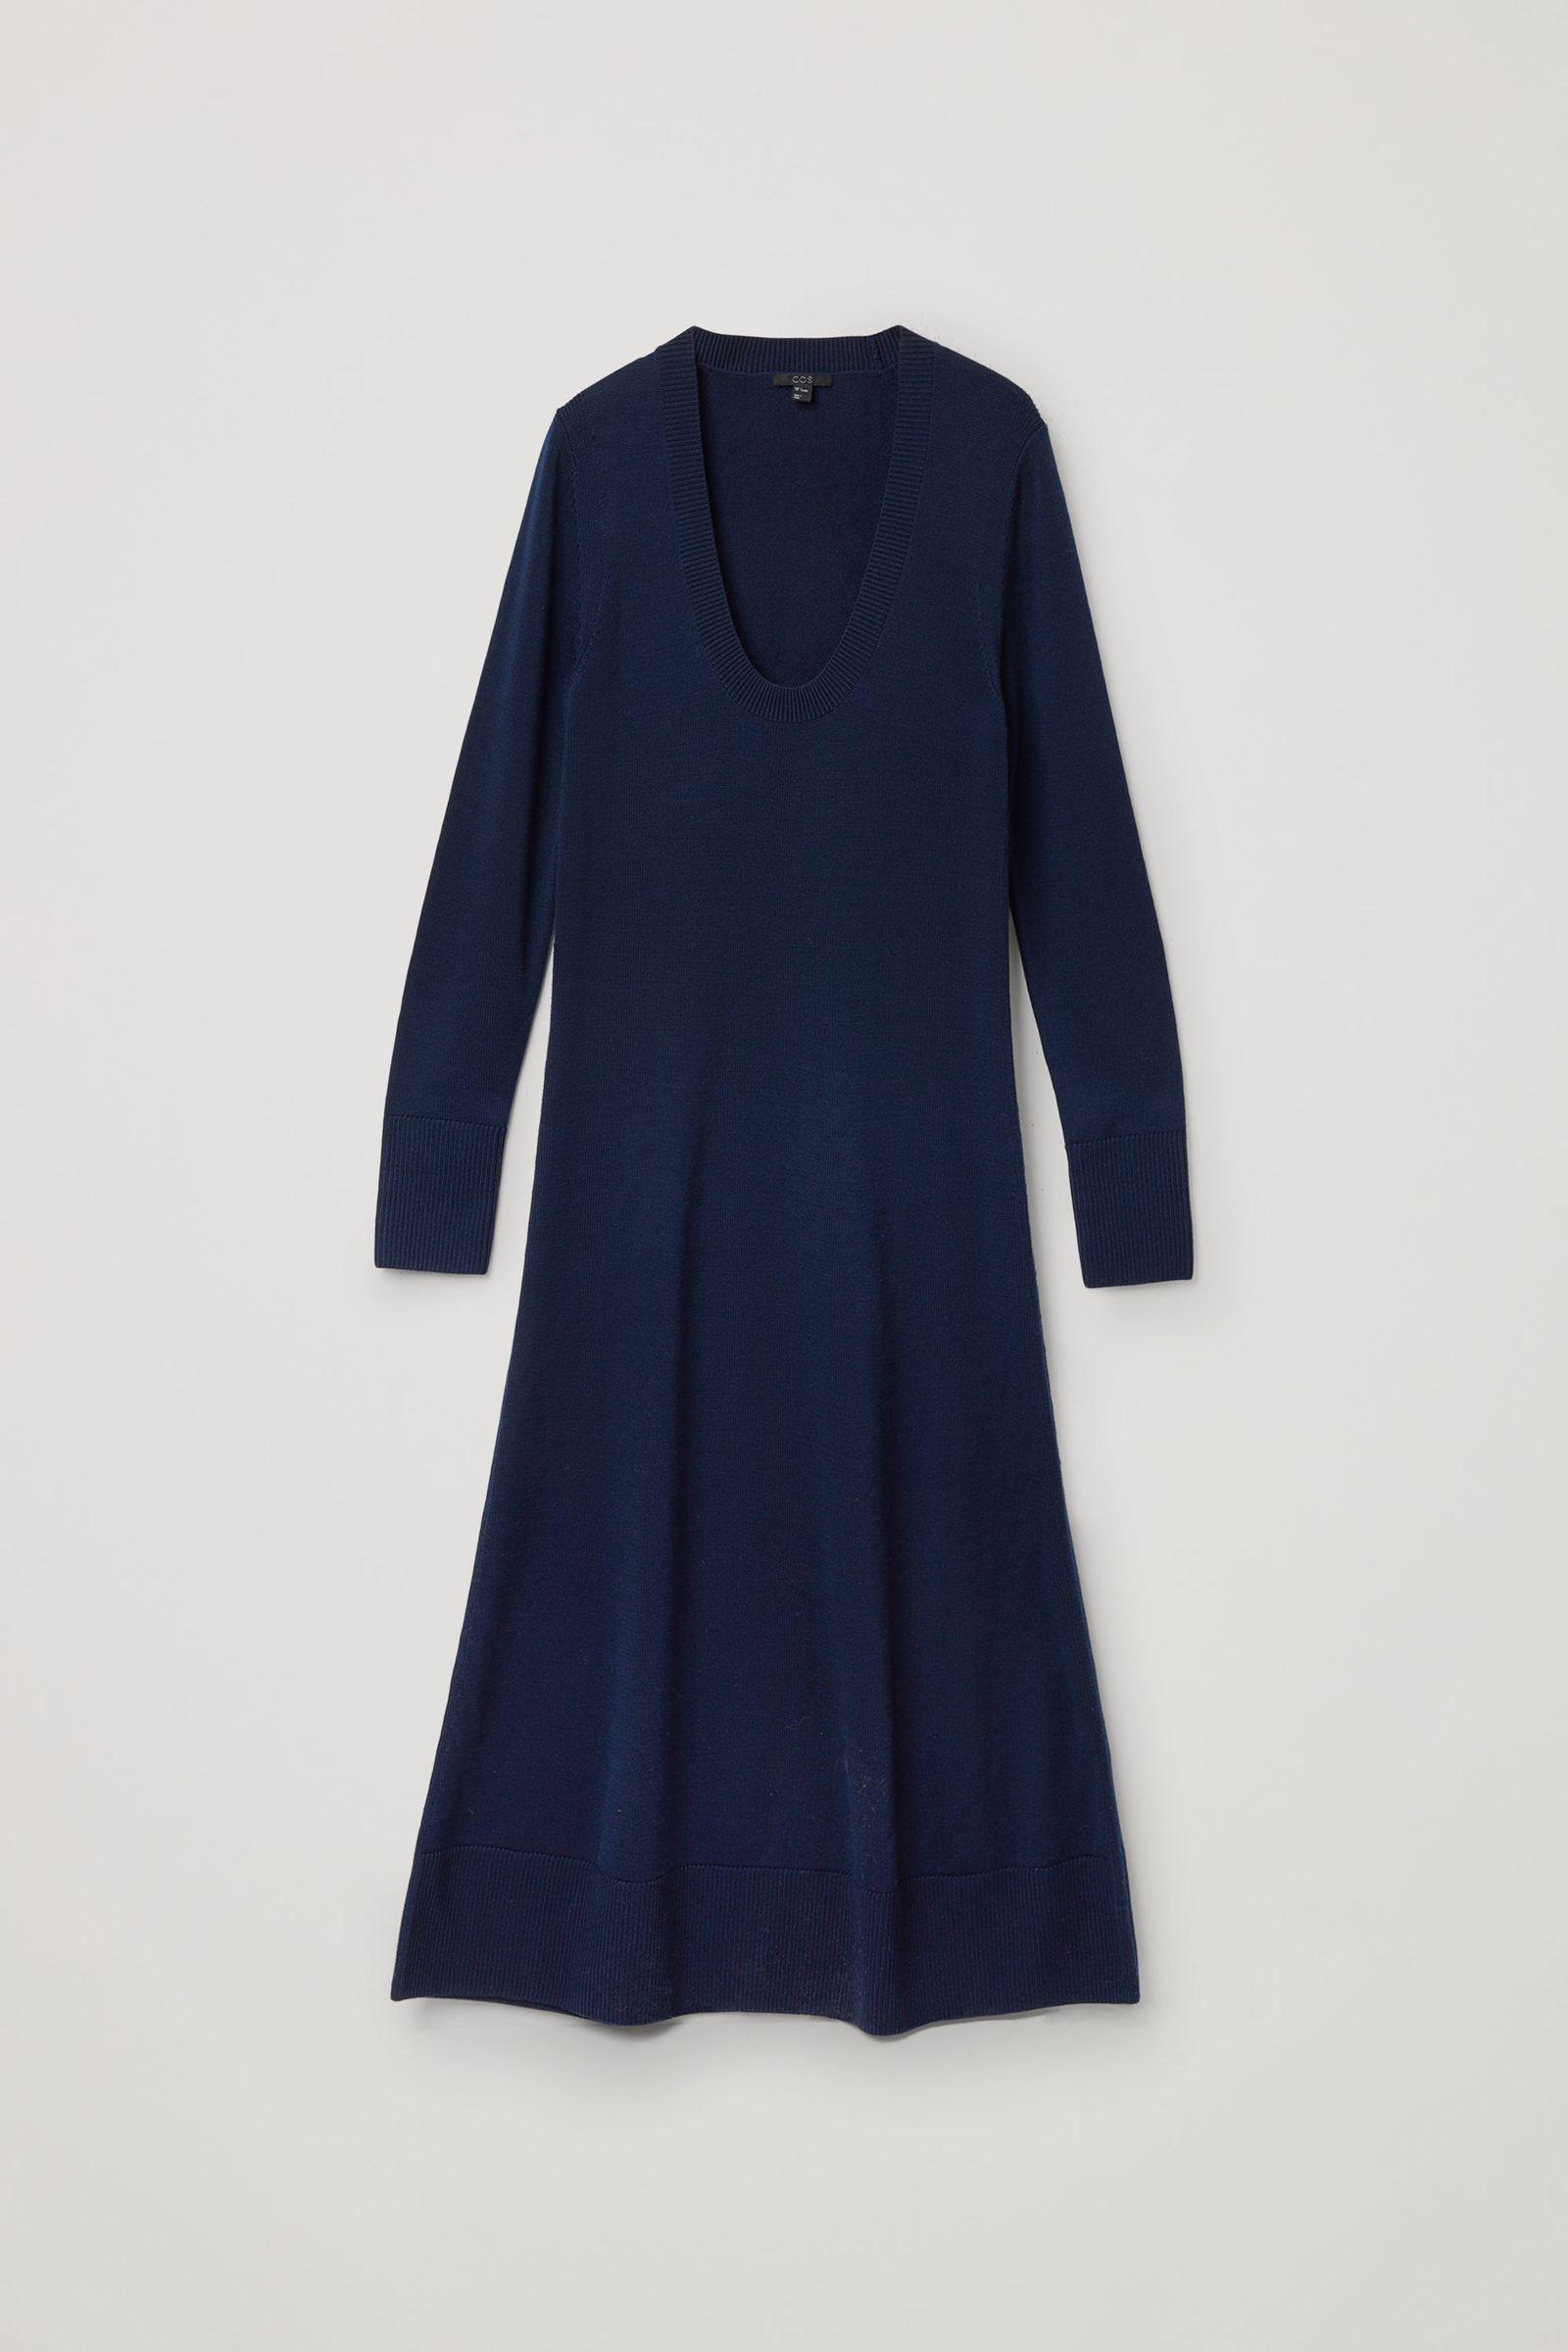 COS A라인 롱 슬리브 니티드 드레스의 블루컬러 Product입니다.